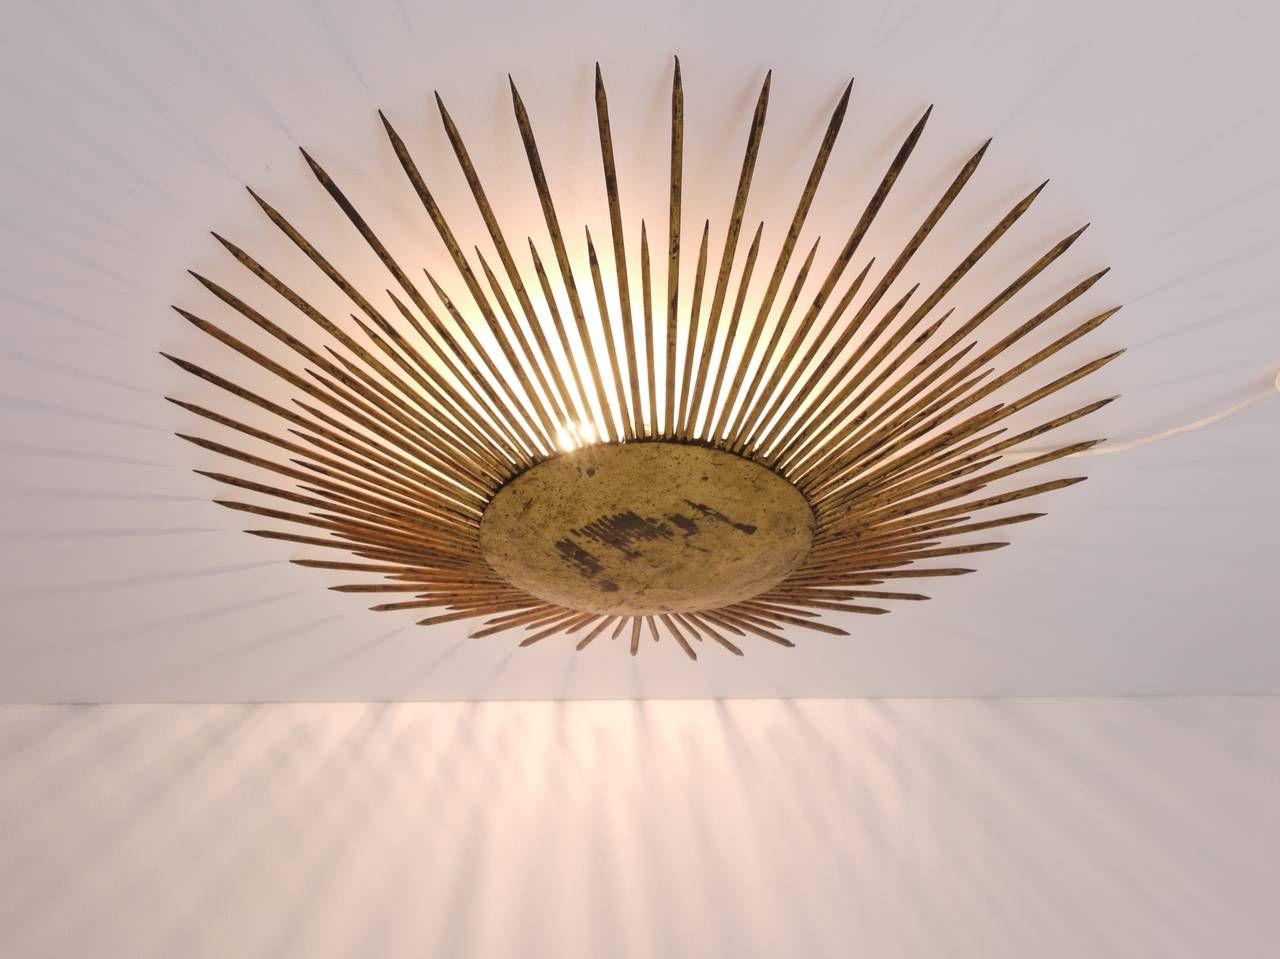 Plafoniere Smart : French sunburst starburst flush mount plafoniere ceiling lamp gilt